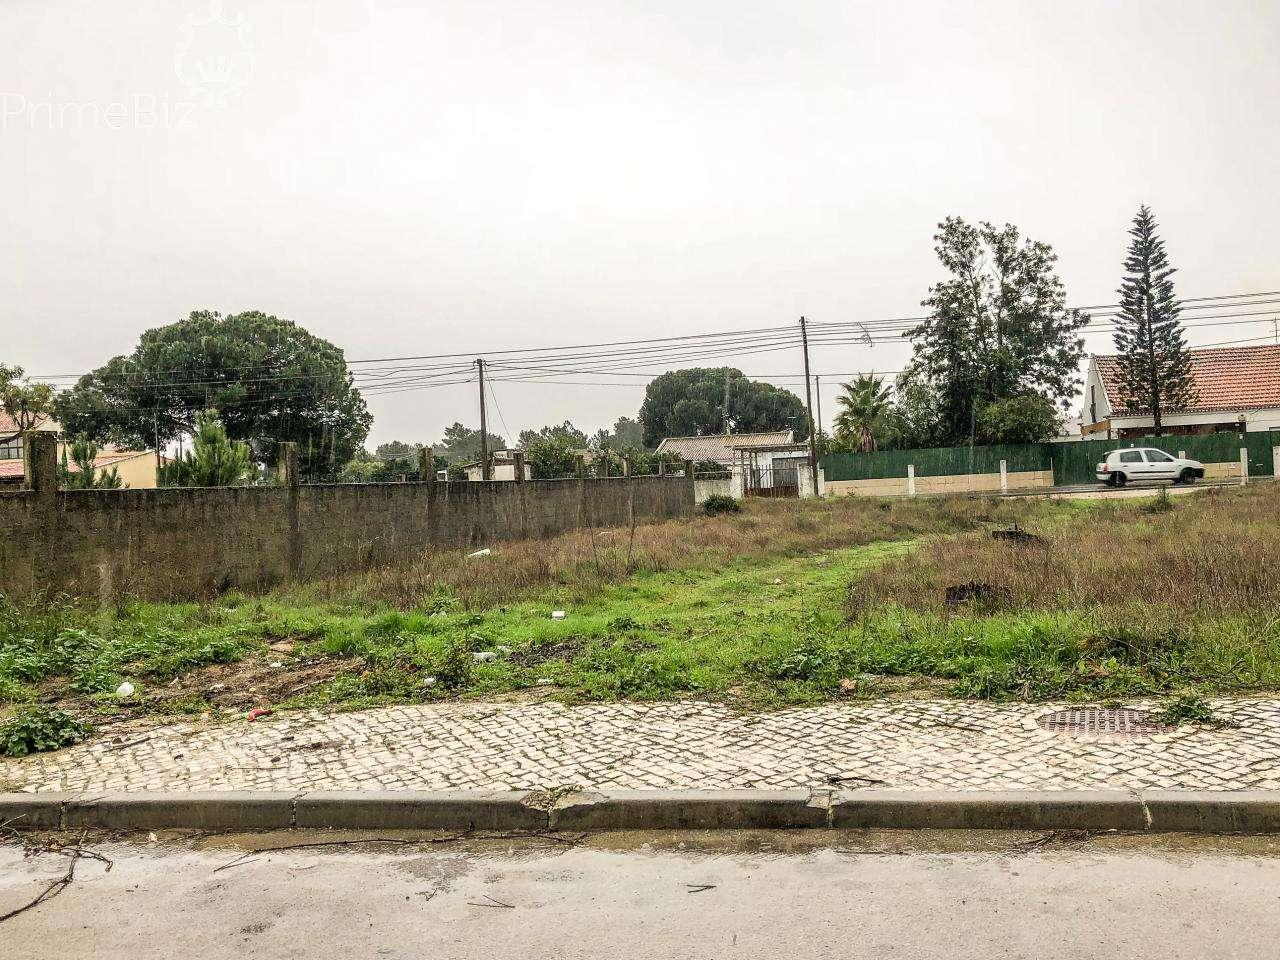 Terreno para comprar, Quinta do Anjo, Palmela, Setúbal - Foto 3